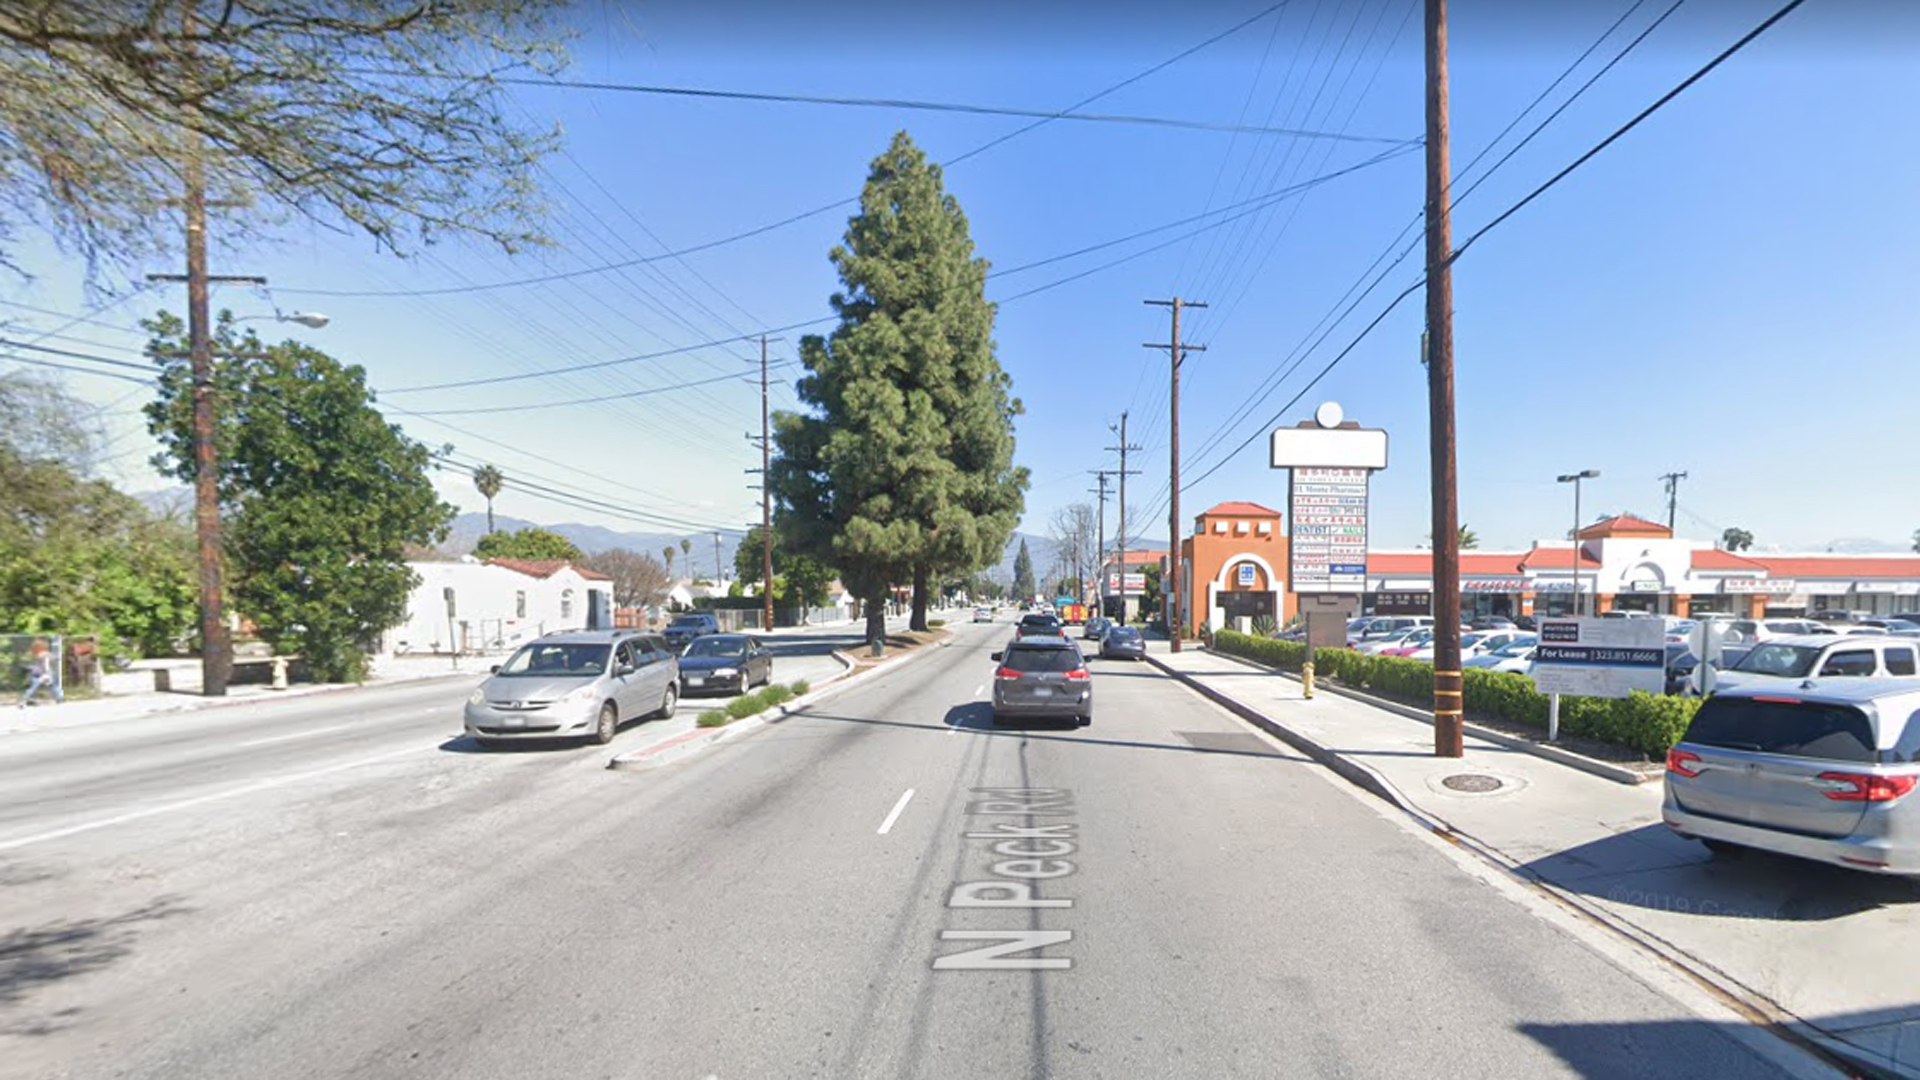 The 4000 block of Peck Road in El Monte, as viewed in a Google Street View image.